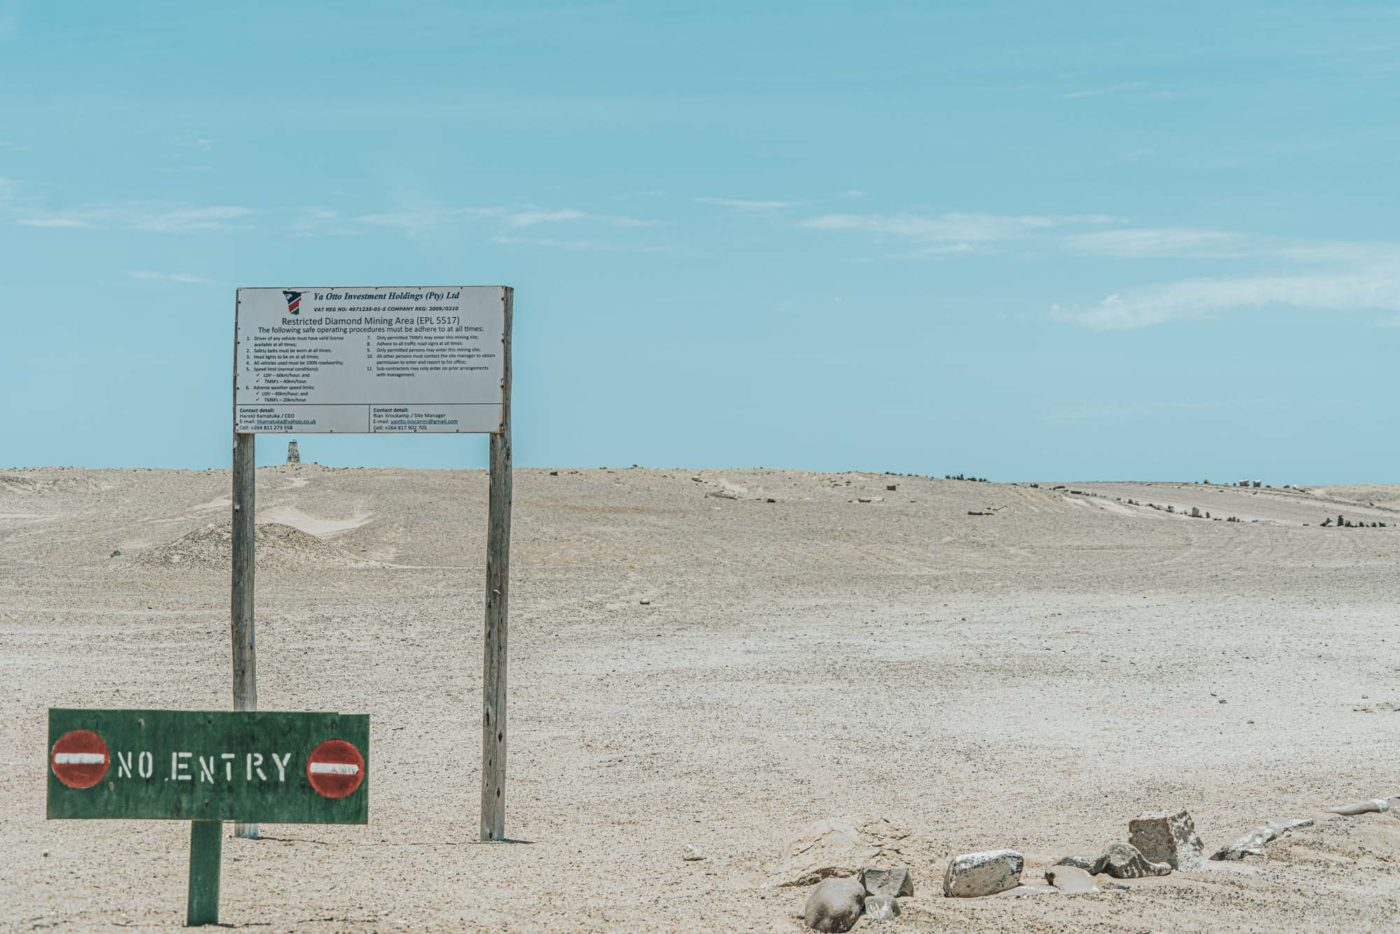 Old mining sites along the Skeleton Coast road